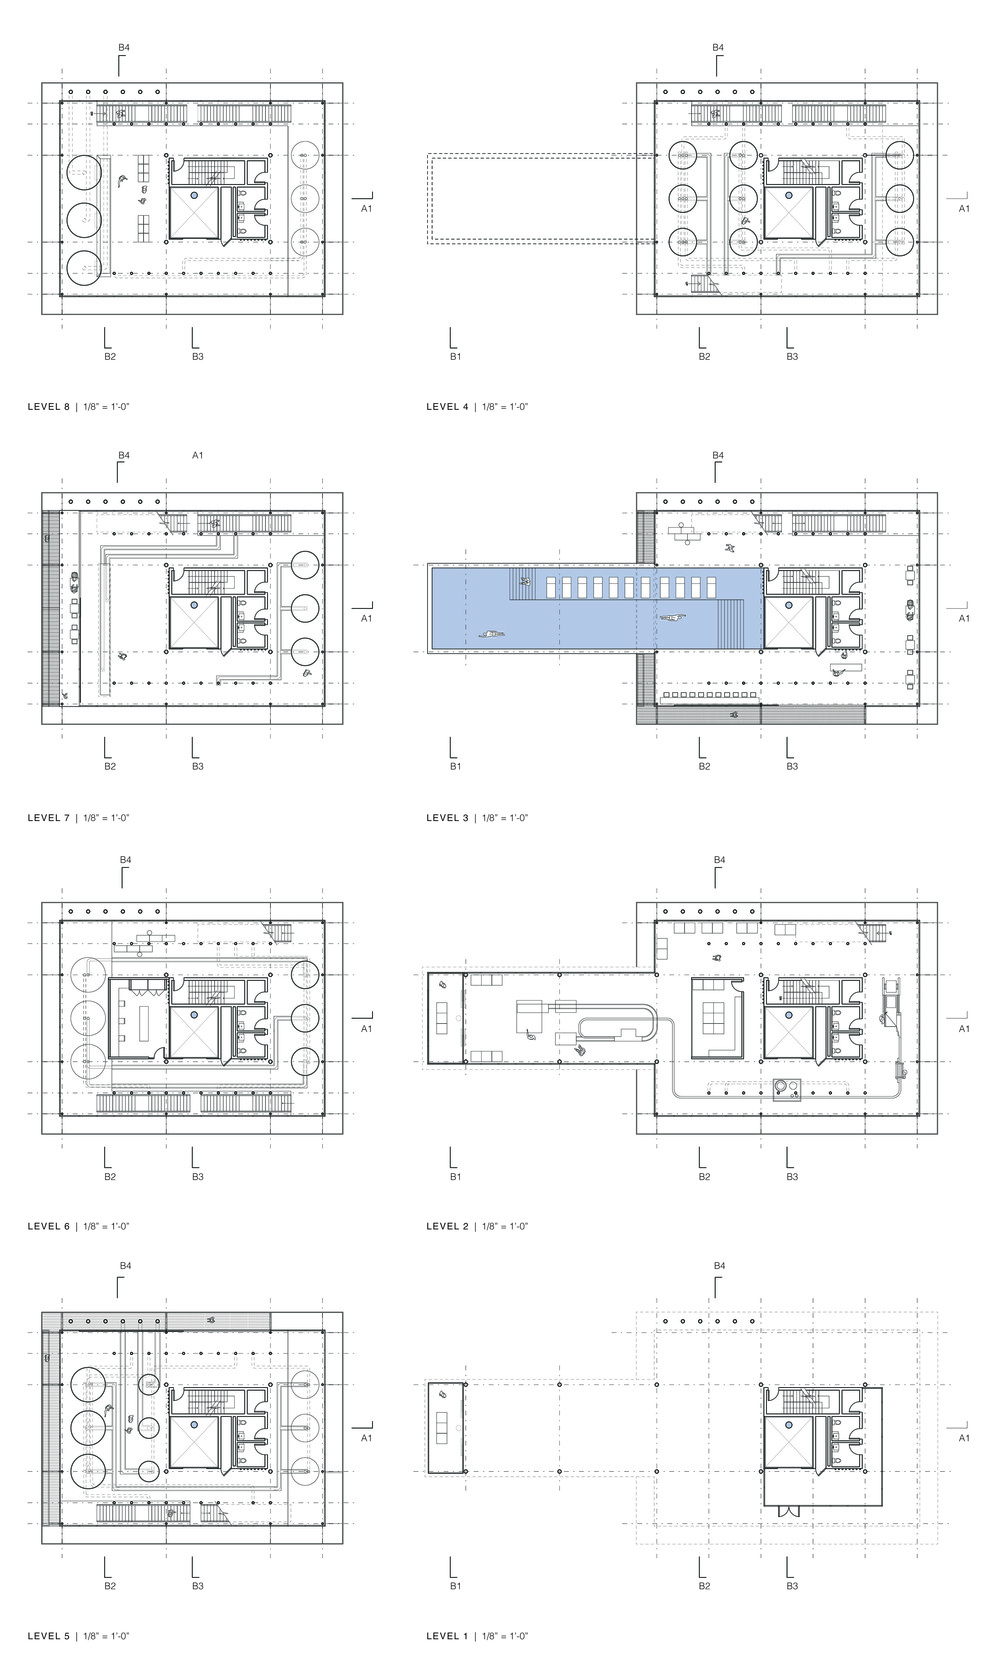 08_Vertical_Brewery_Alejandra_Fernandez_Floor_Plans.jpg